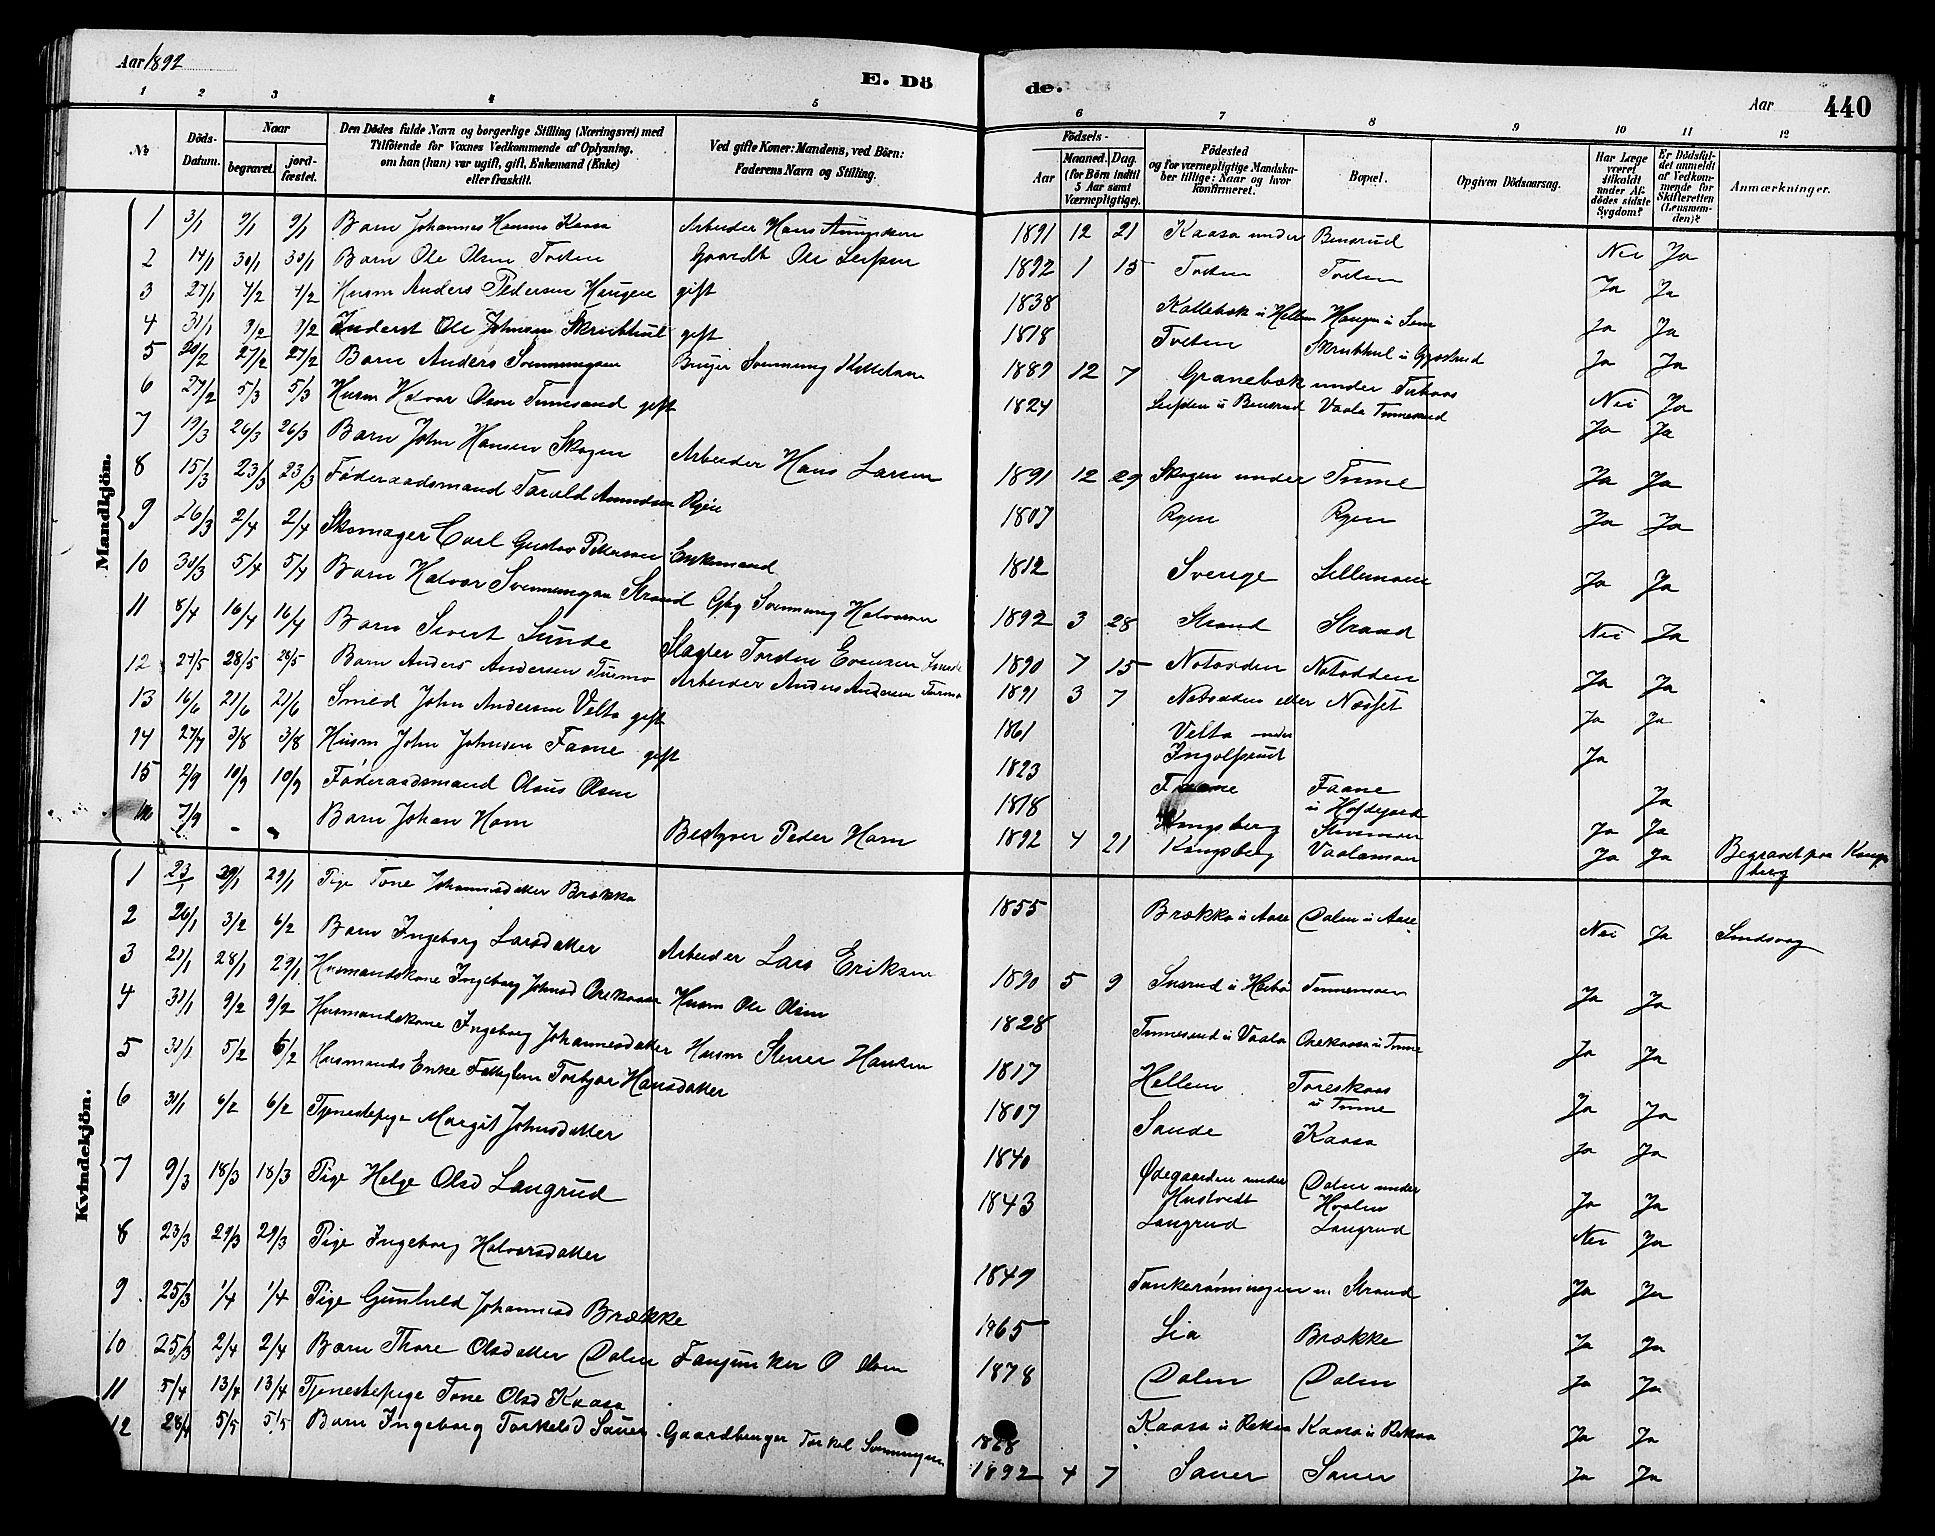 SAKO, Heddal kirkebøker, G/Ga/L0002: Klokkerbok nr. I 2, 1879-1908, s. 440